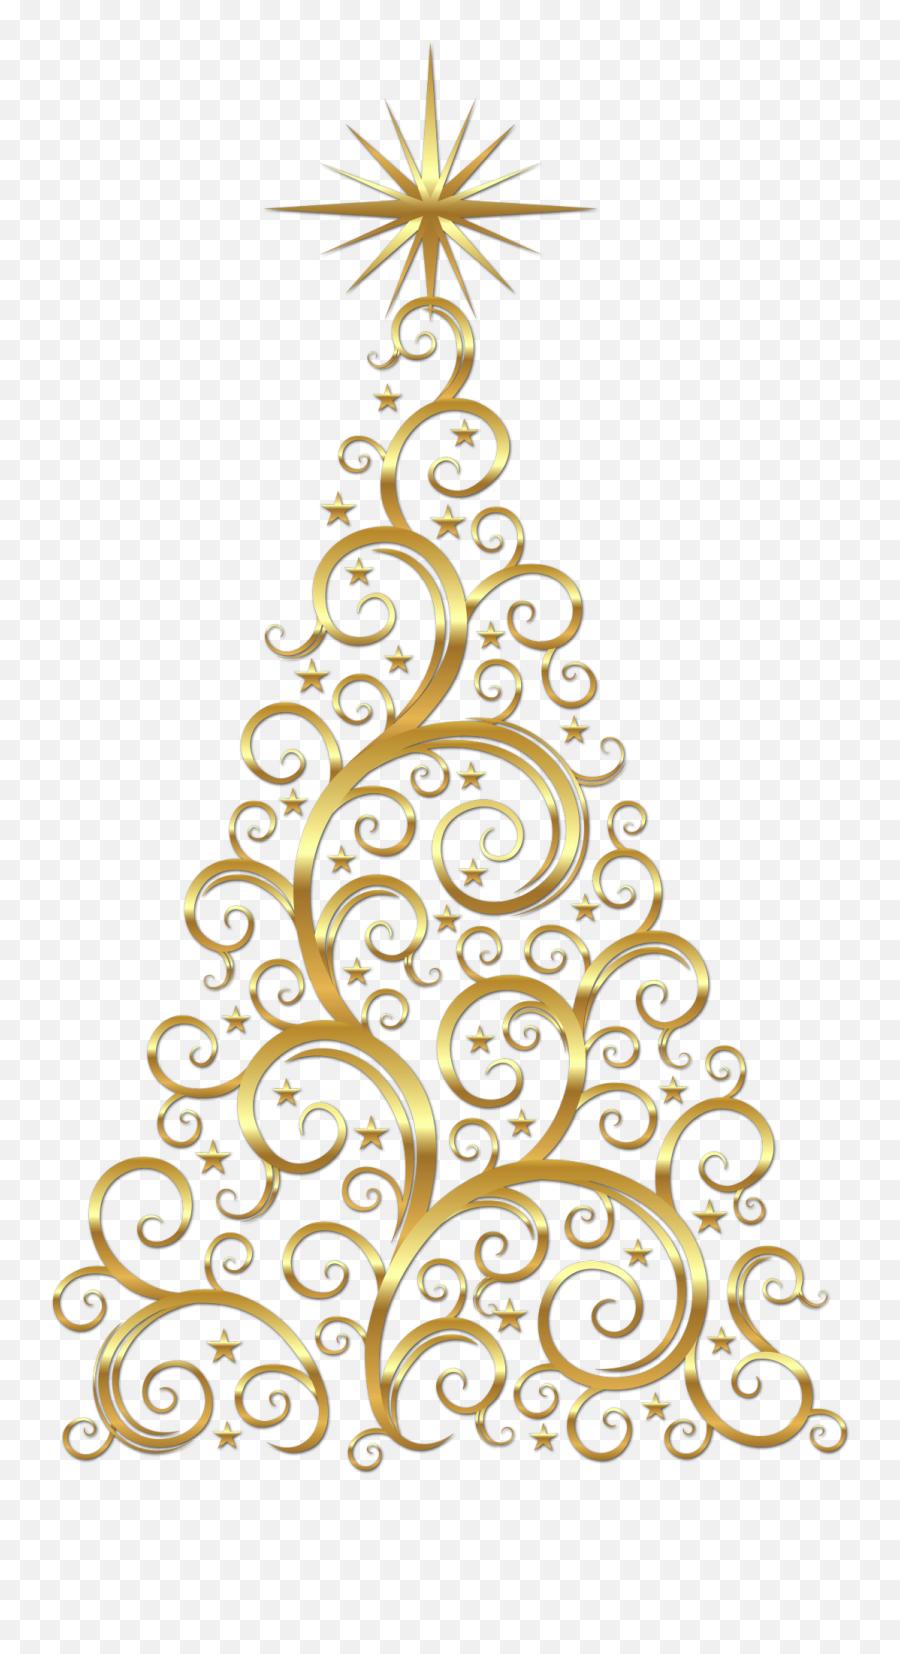 Christmas Tree Vector Banner Royalty - Gold Christmas Tree Clipart Emoji,Christmas Tree Emoticon